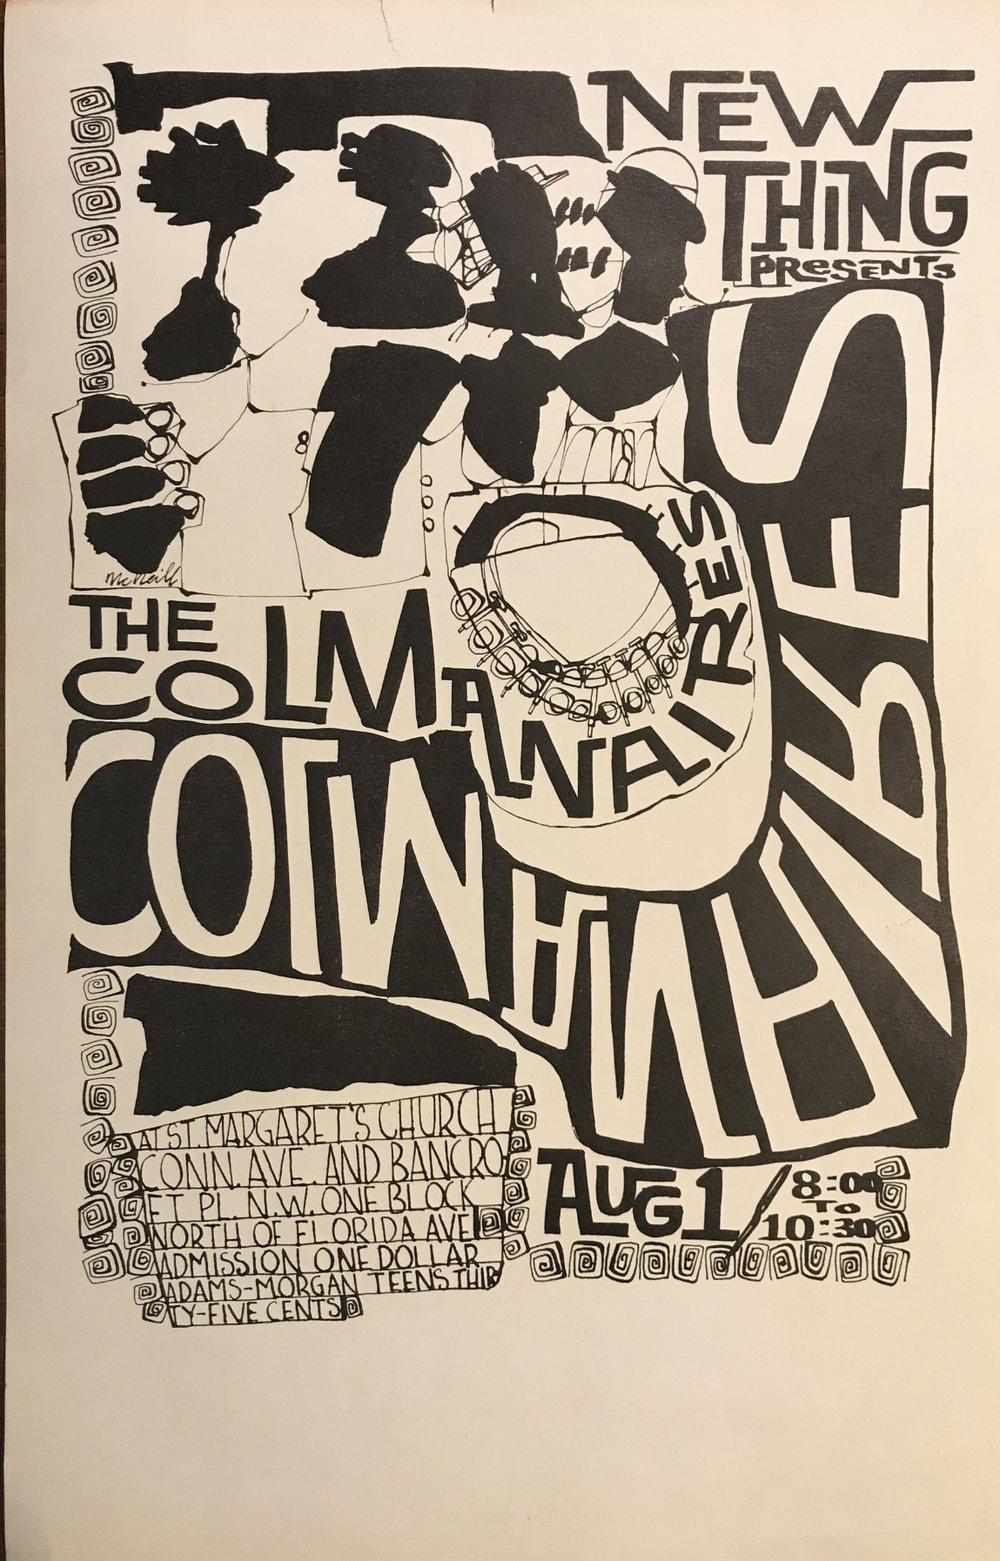 colmonaires 1970 hassan.jpg